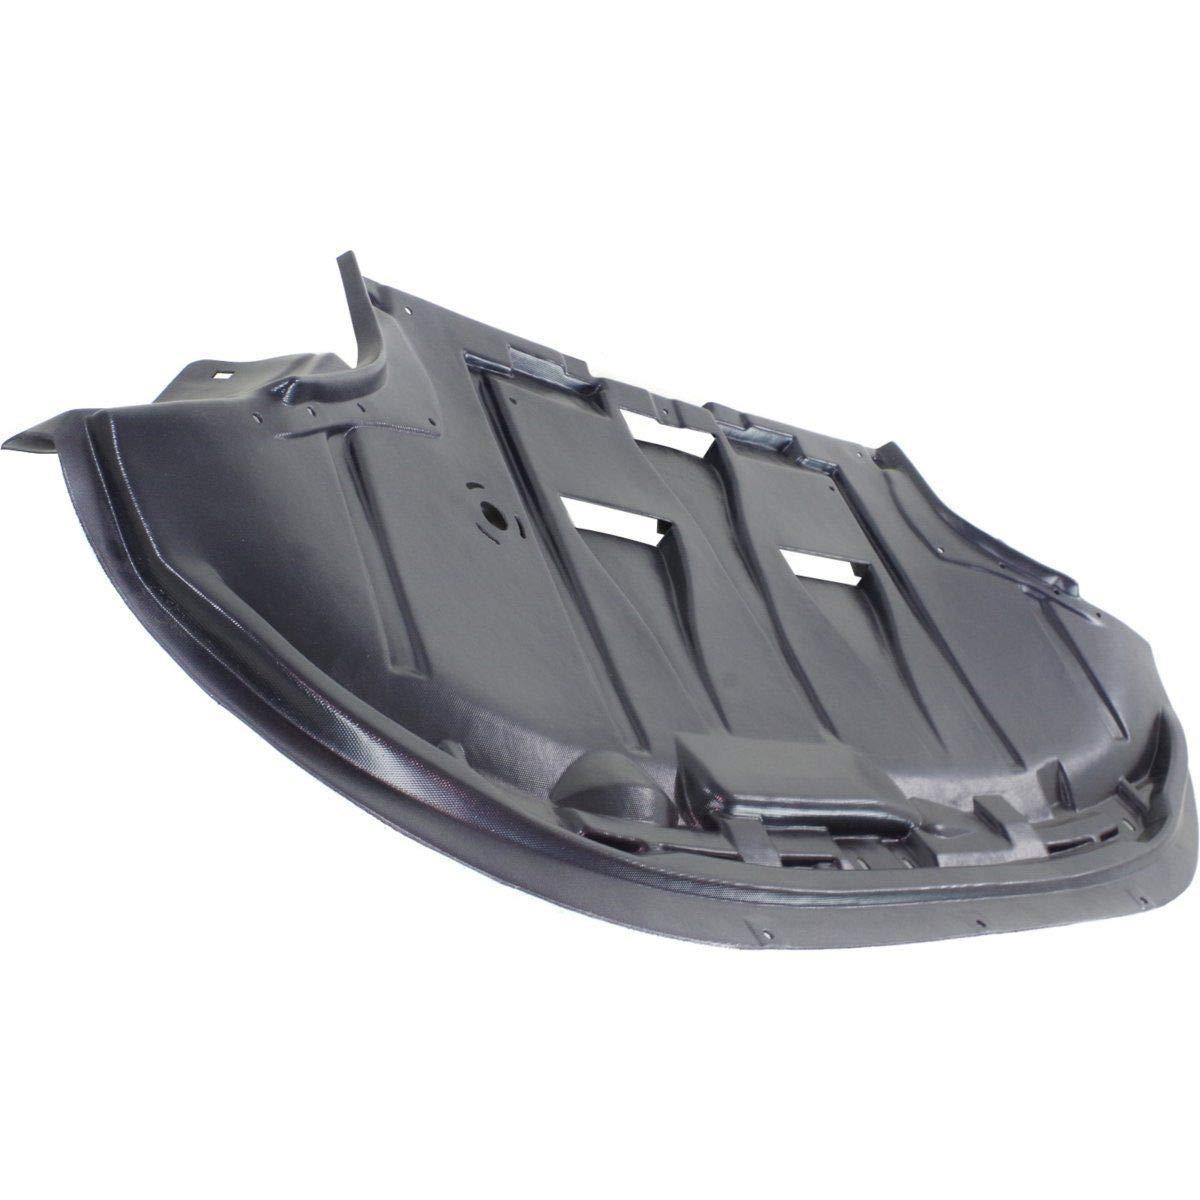 Garage-Pro Front Engine Splash Shield for AUDI A6 QUATTRO 2005-2011 Under Cover 3.0L//3.2L//4.2L Eng.